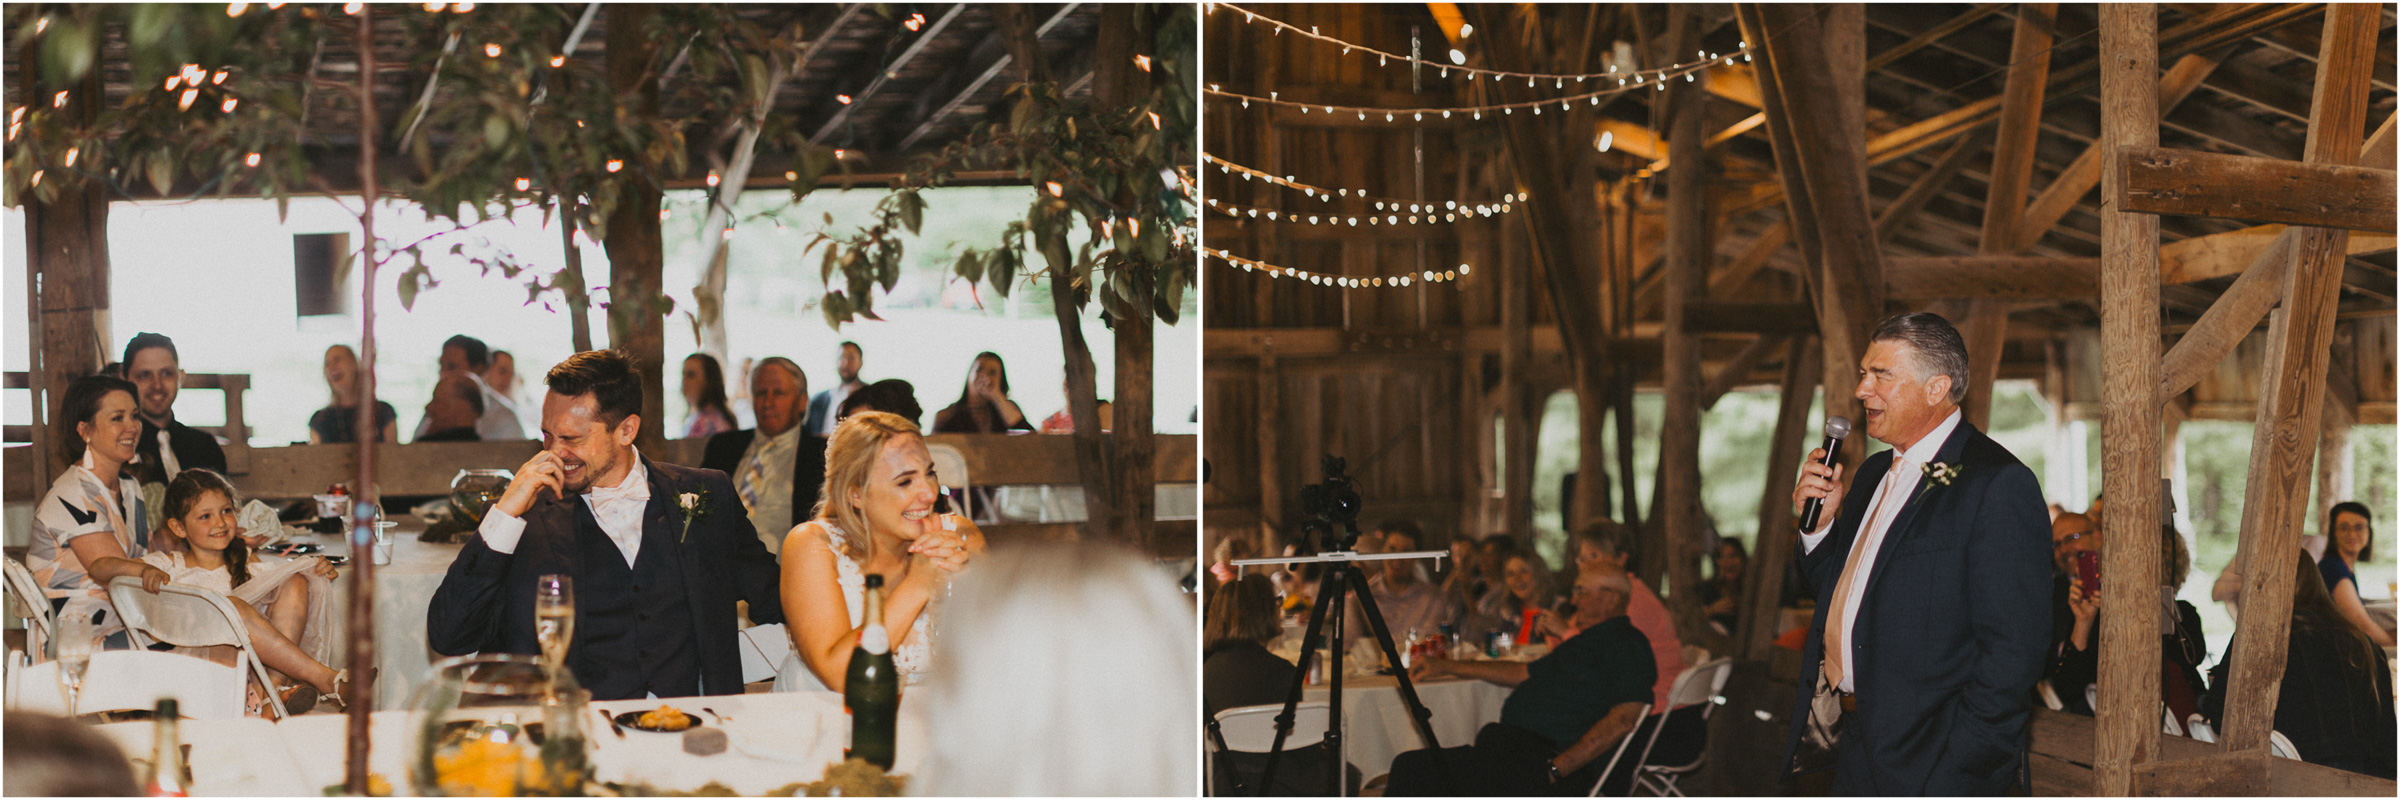 alyssa barletter photography nelson wedding nebraska city lied lodge morton barn spring wedding photographer-52.jpg